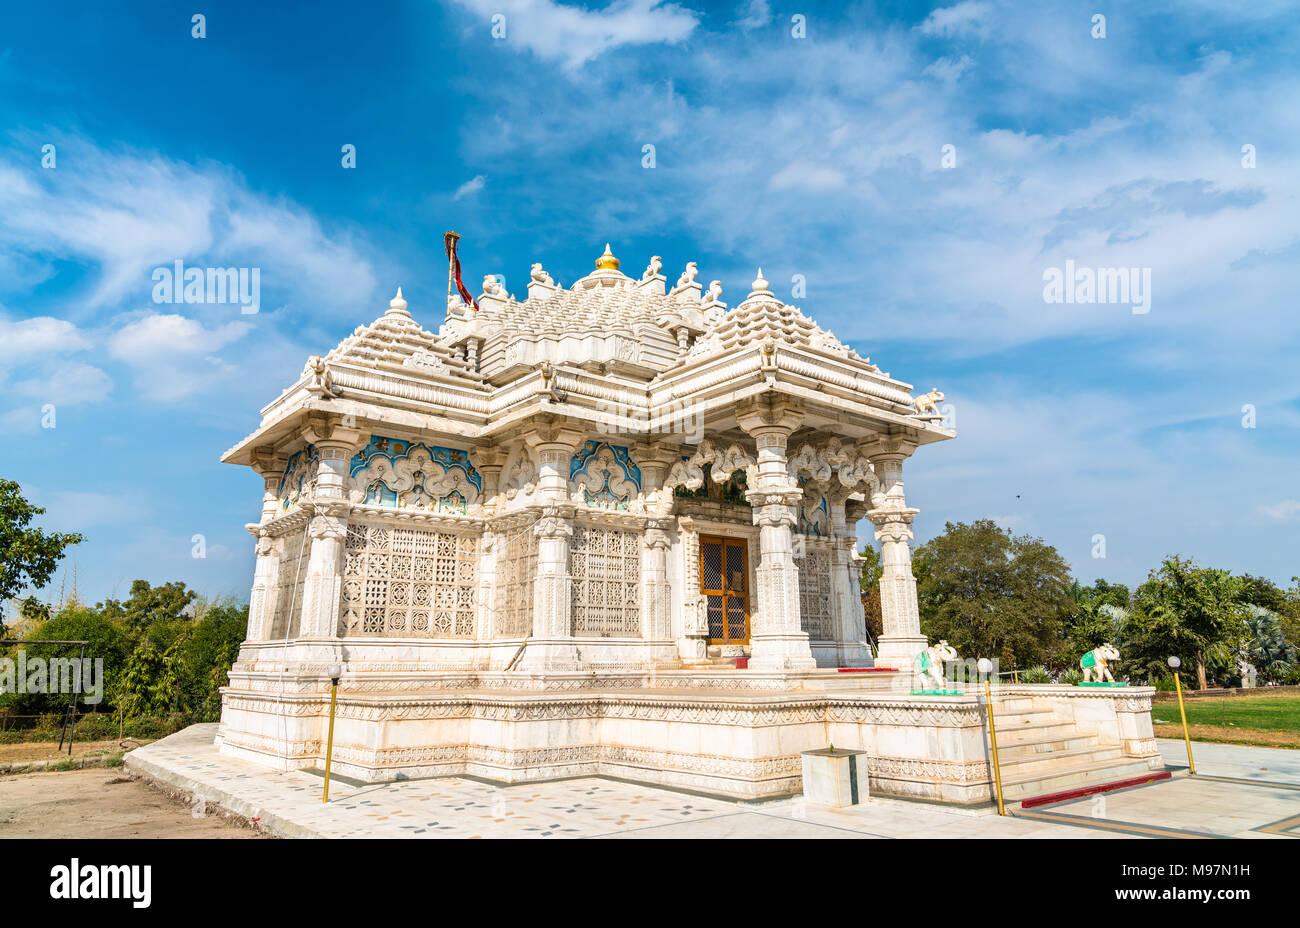 Borij Derasar, a Jain Temple in Gandhinagar - Gujarat State of India - Stock Image